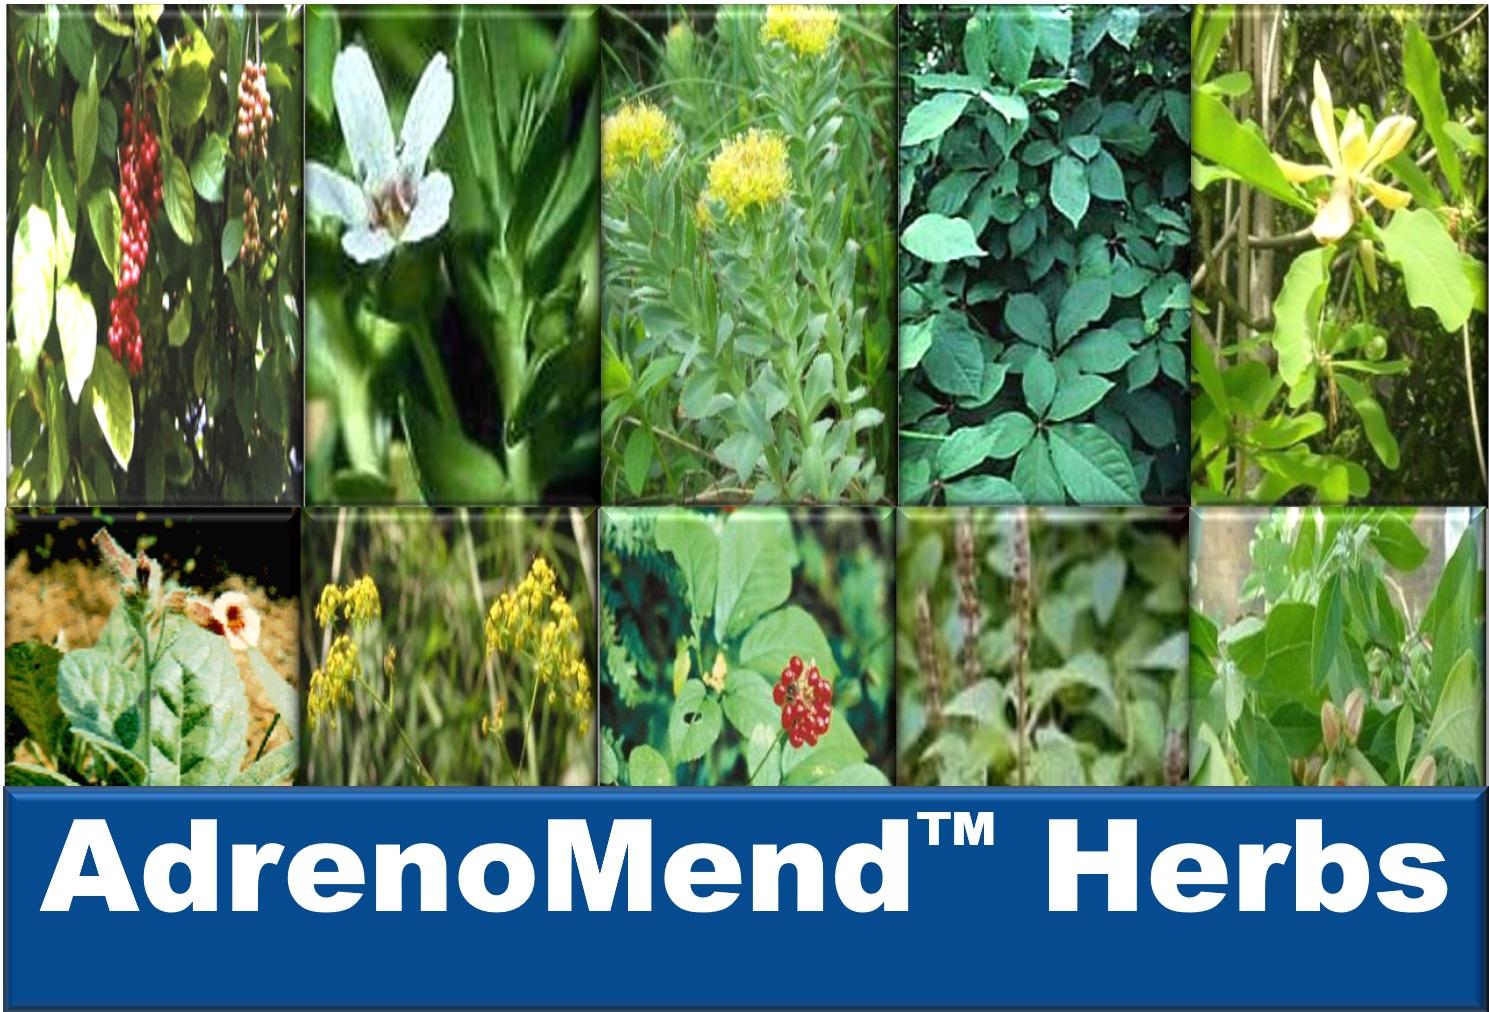 AdrenoMend™ Herbs